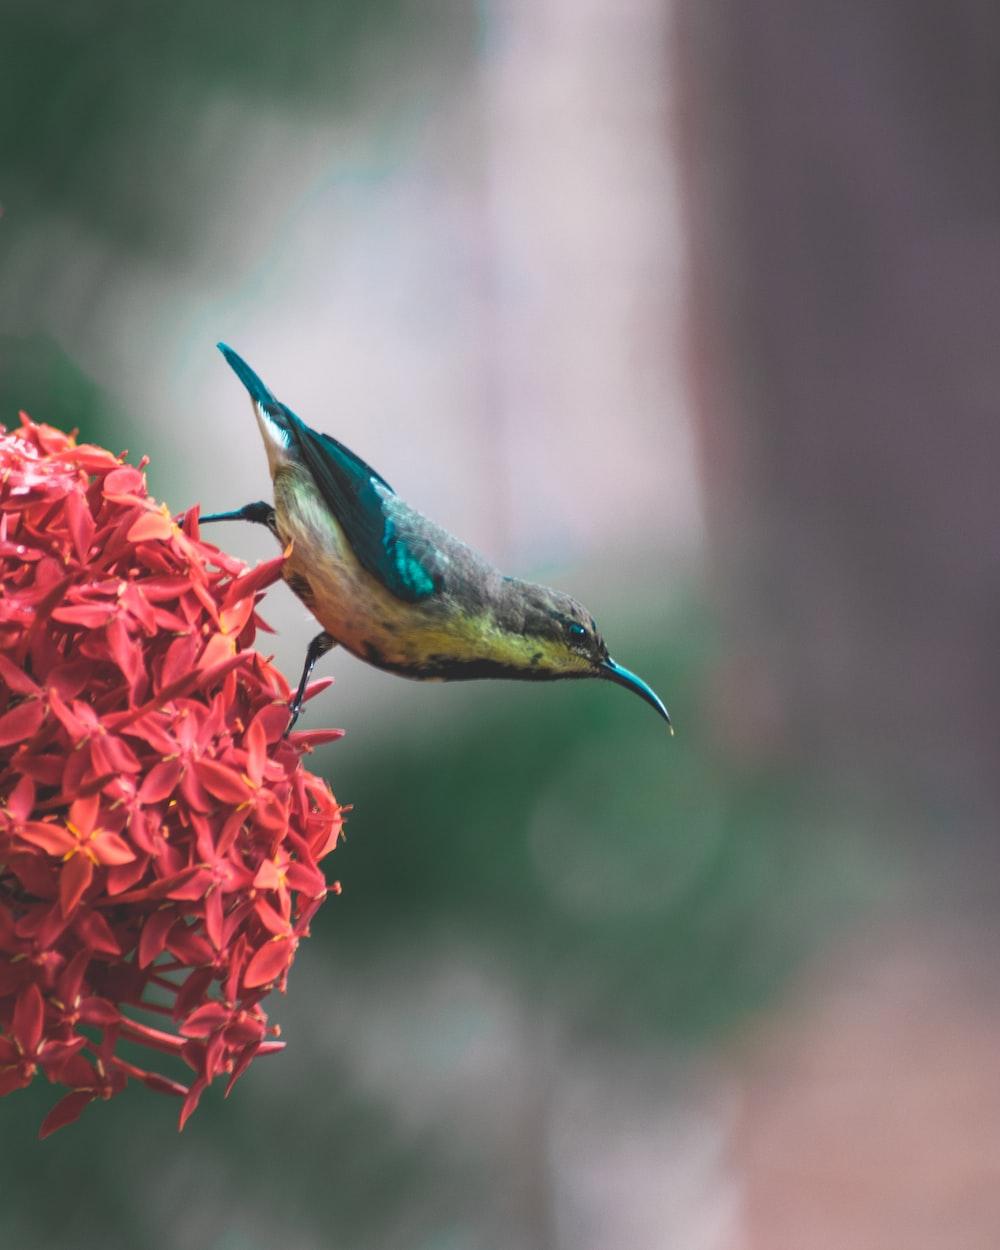 coraciiformes bird on red ixora flower